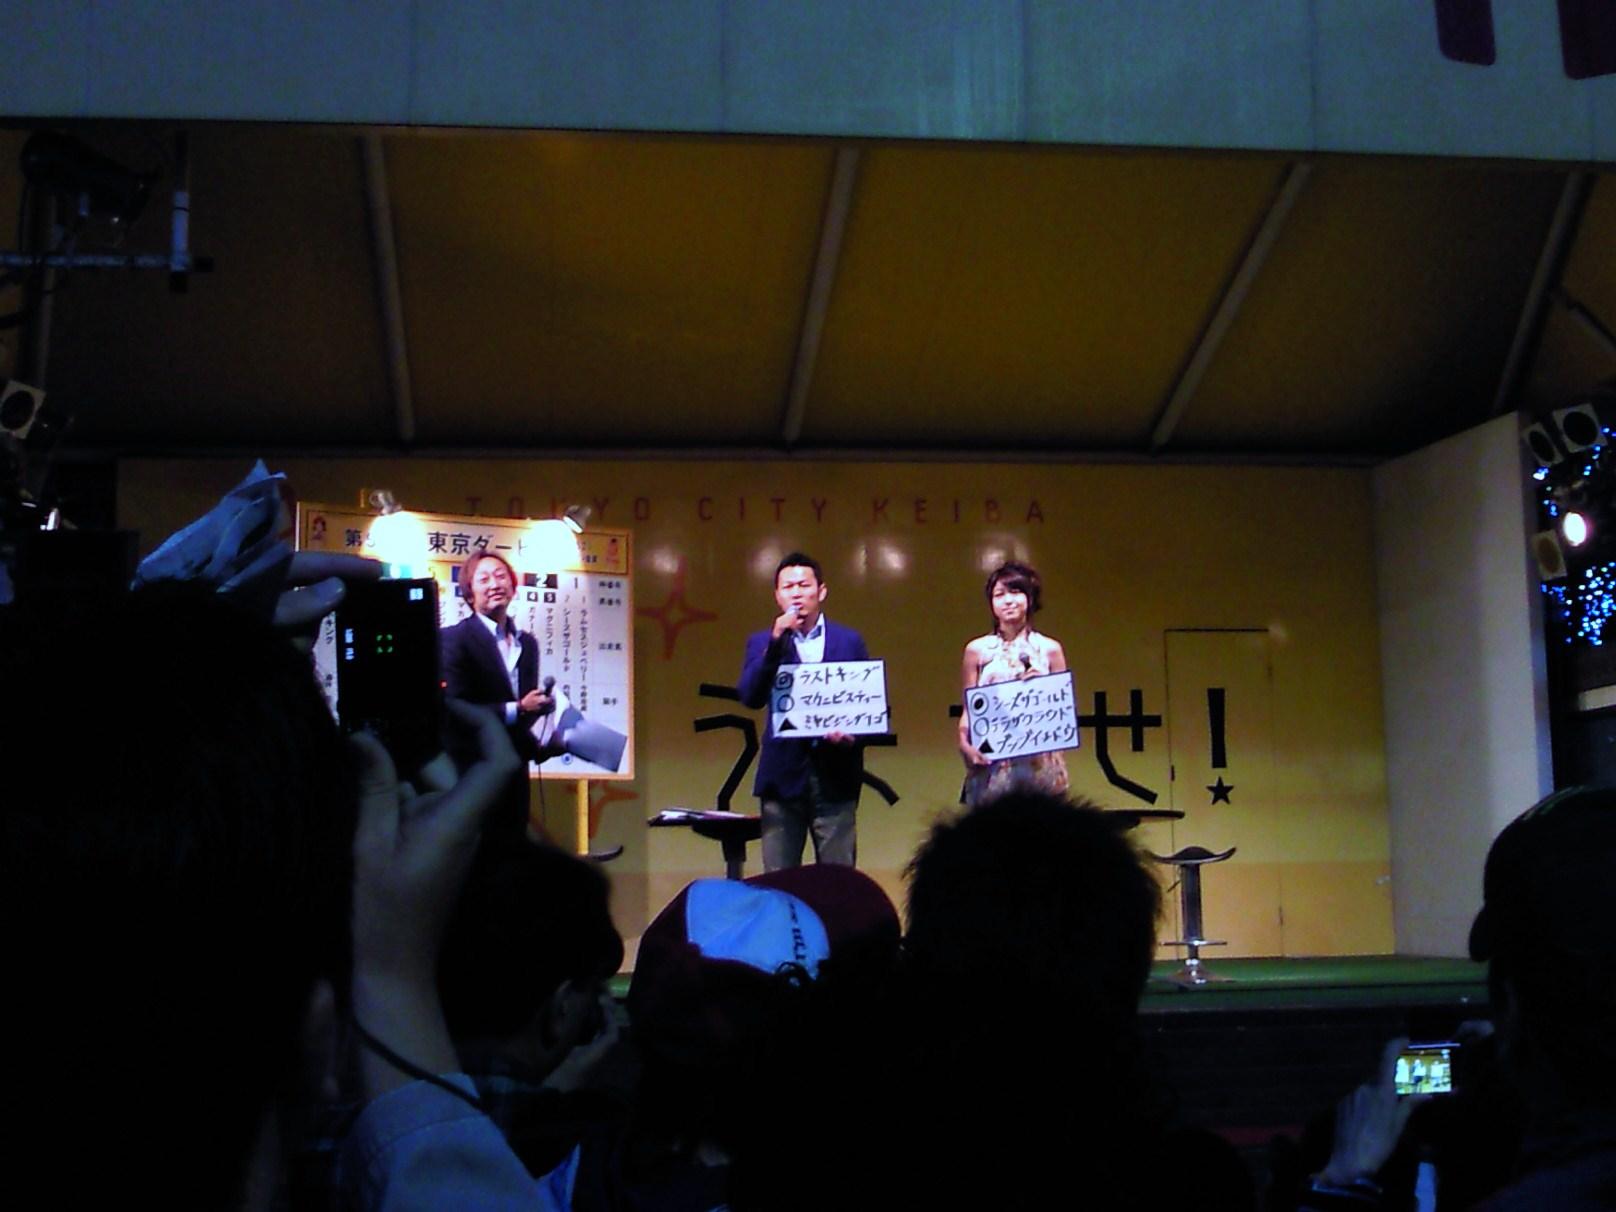 磯幸須藤元気と国民新党的美少女中村静香の東京ダービー予想会